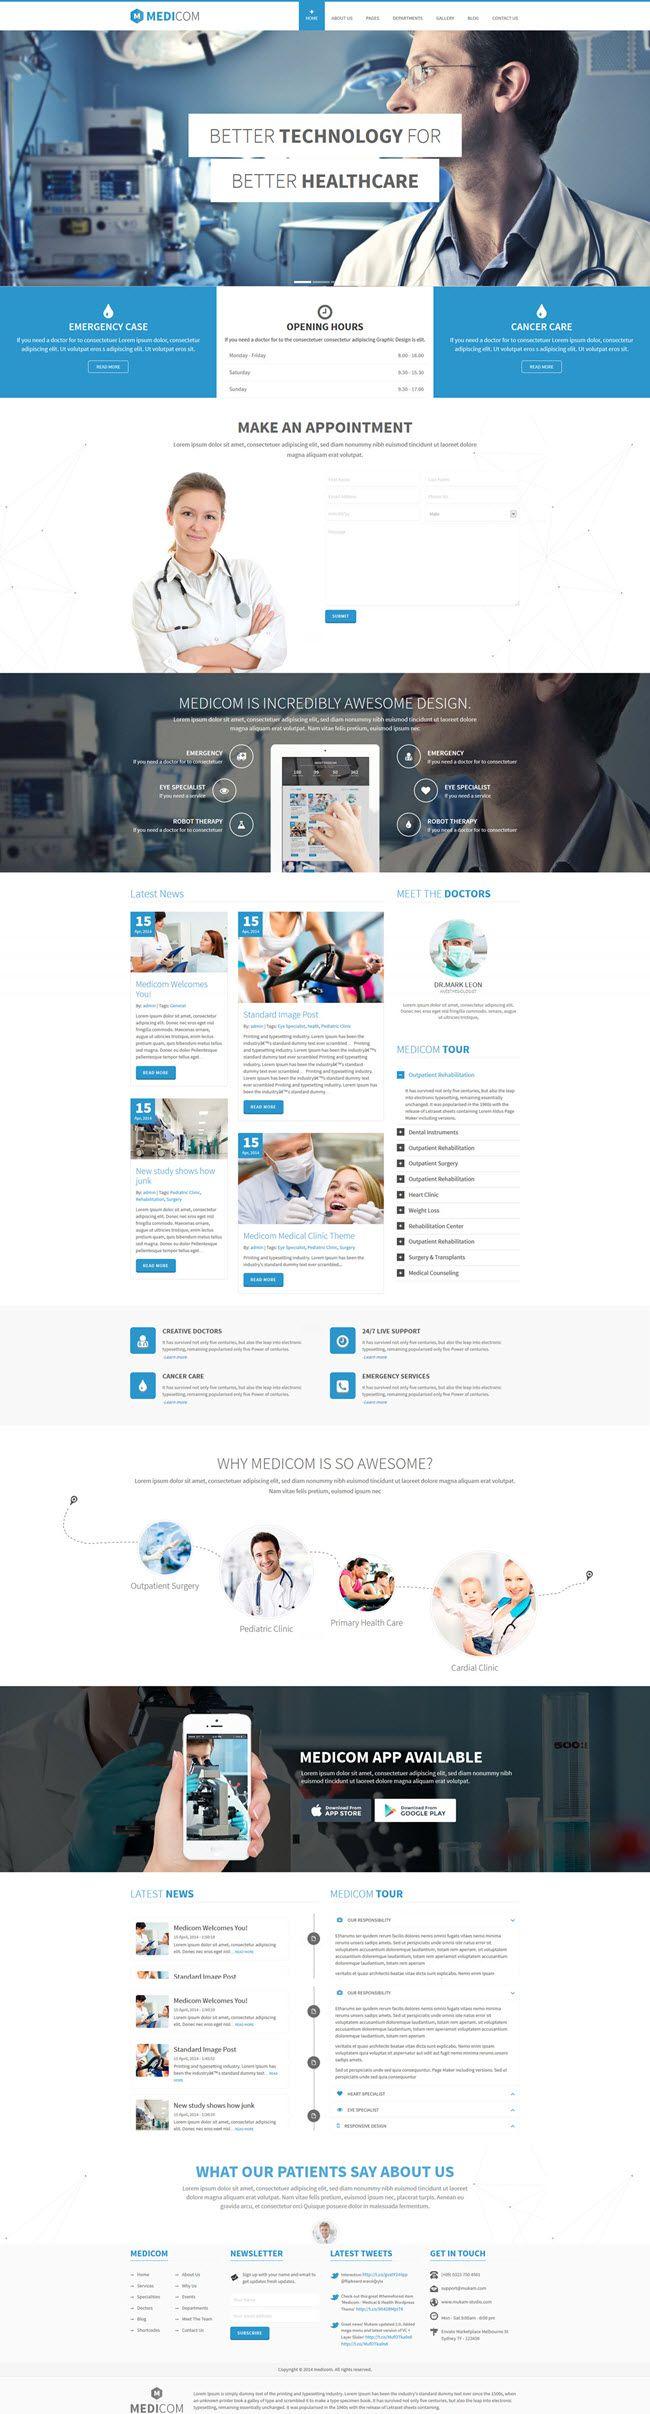 medicom screenshot Best Medical & Health WordPress Themes